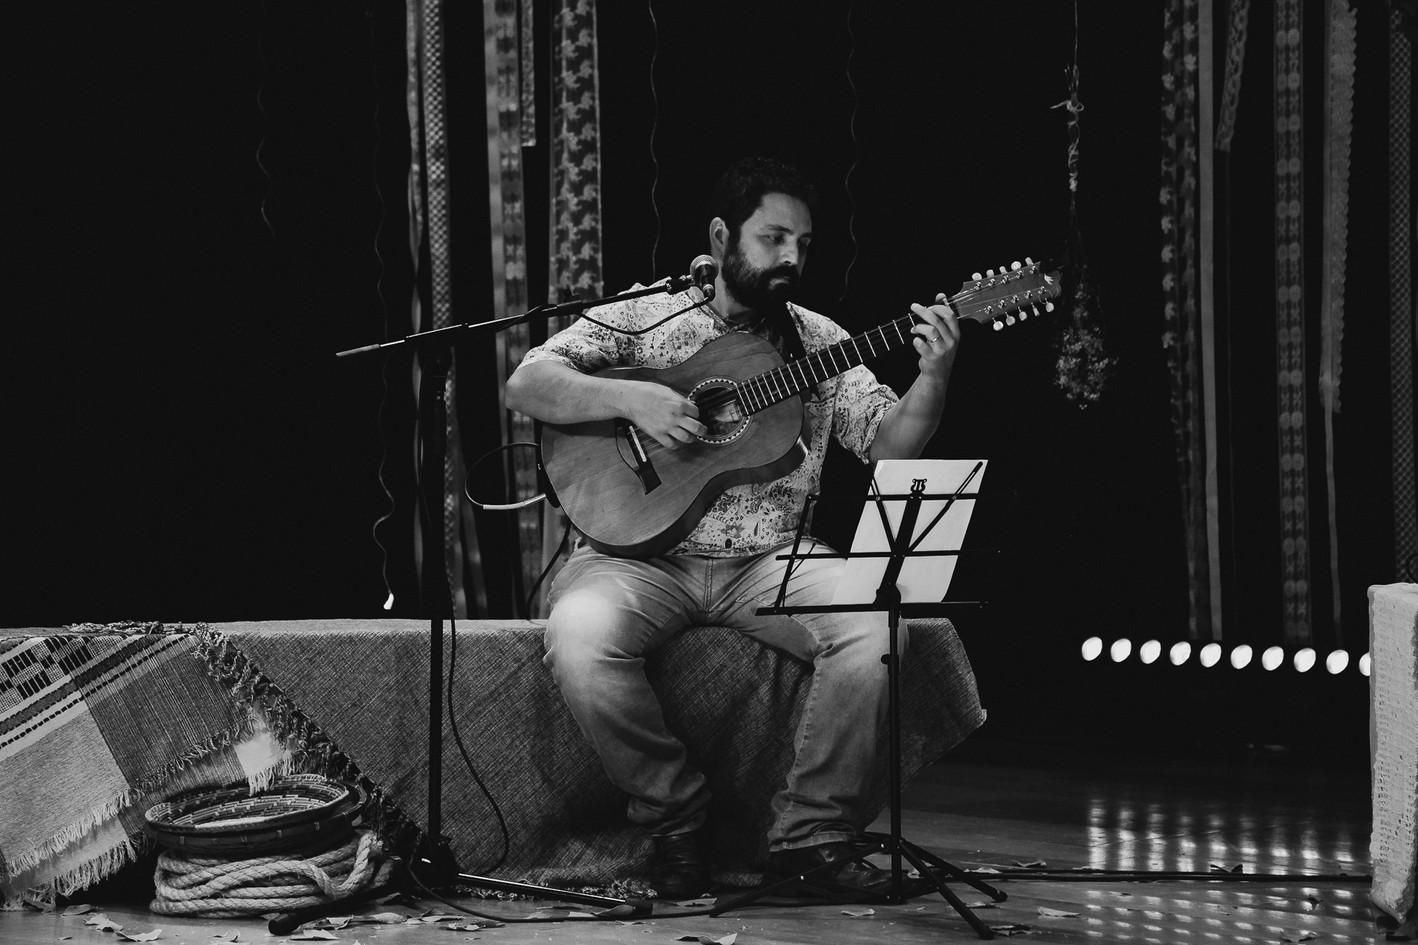 Festival_PenaBranca_Xavantinho_IMG_6589.